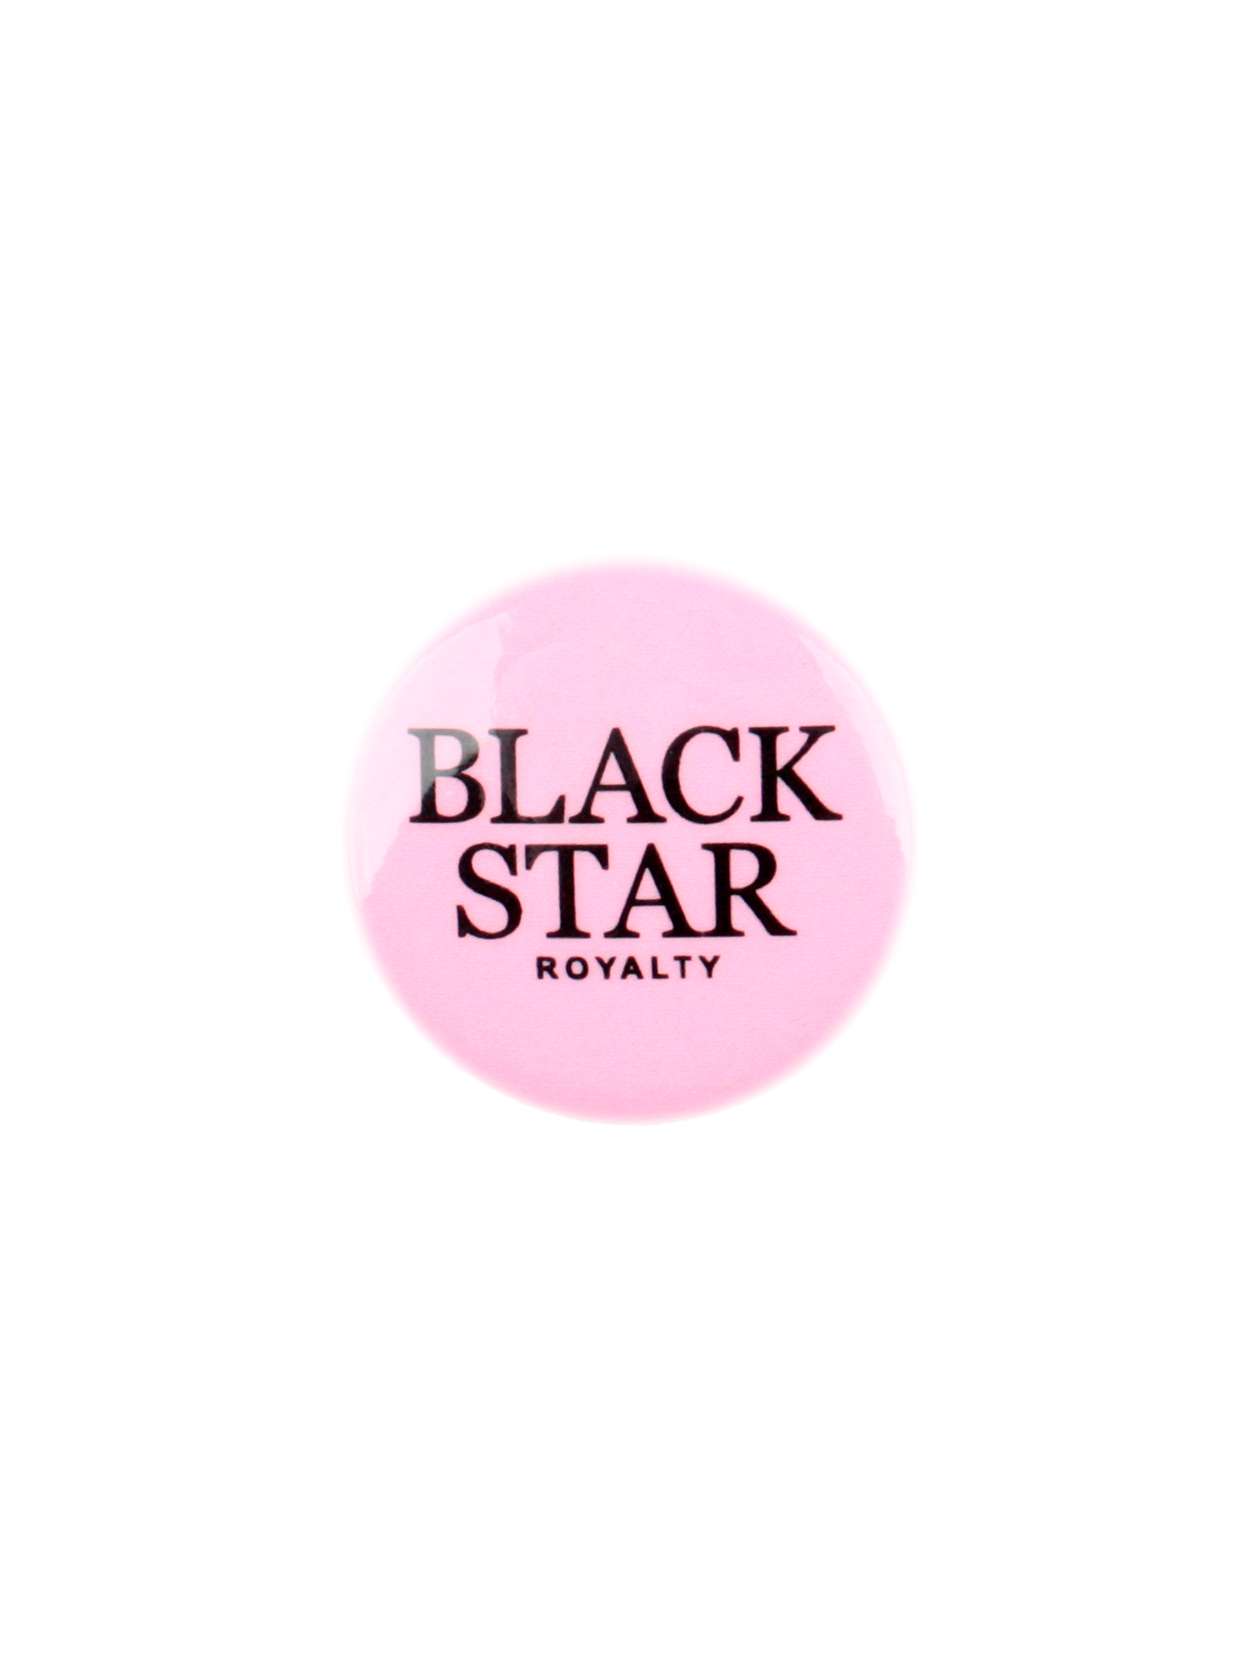 Значок ROYALTY BLACK STAR, Pink